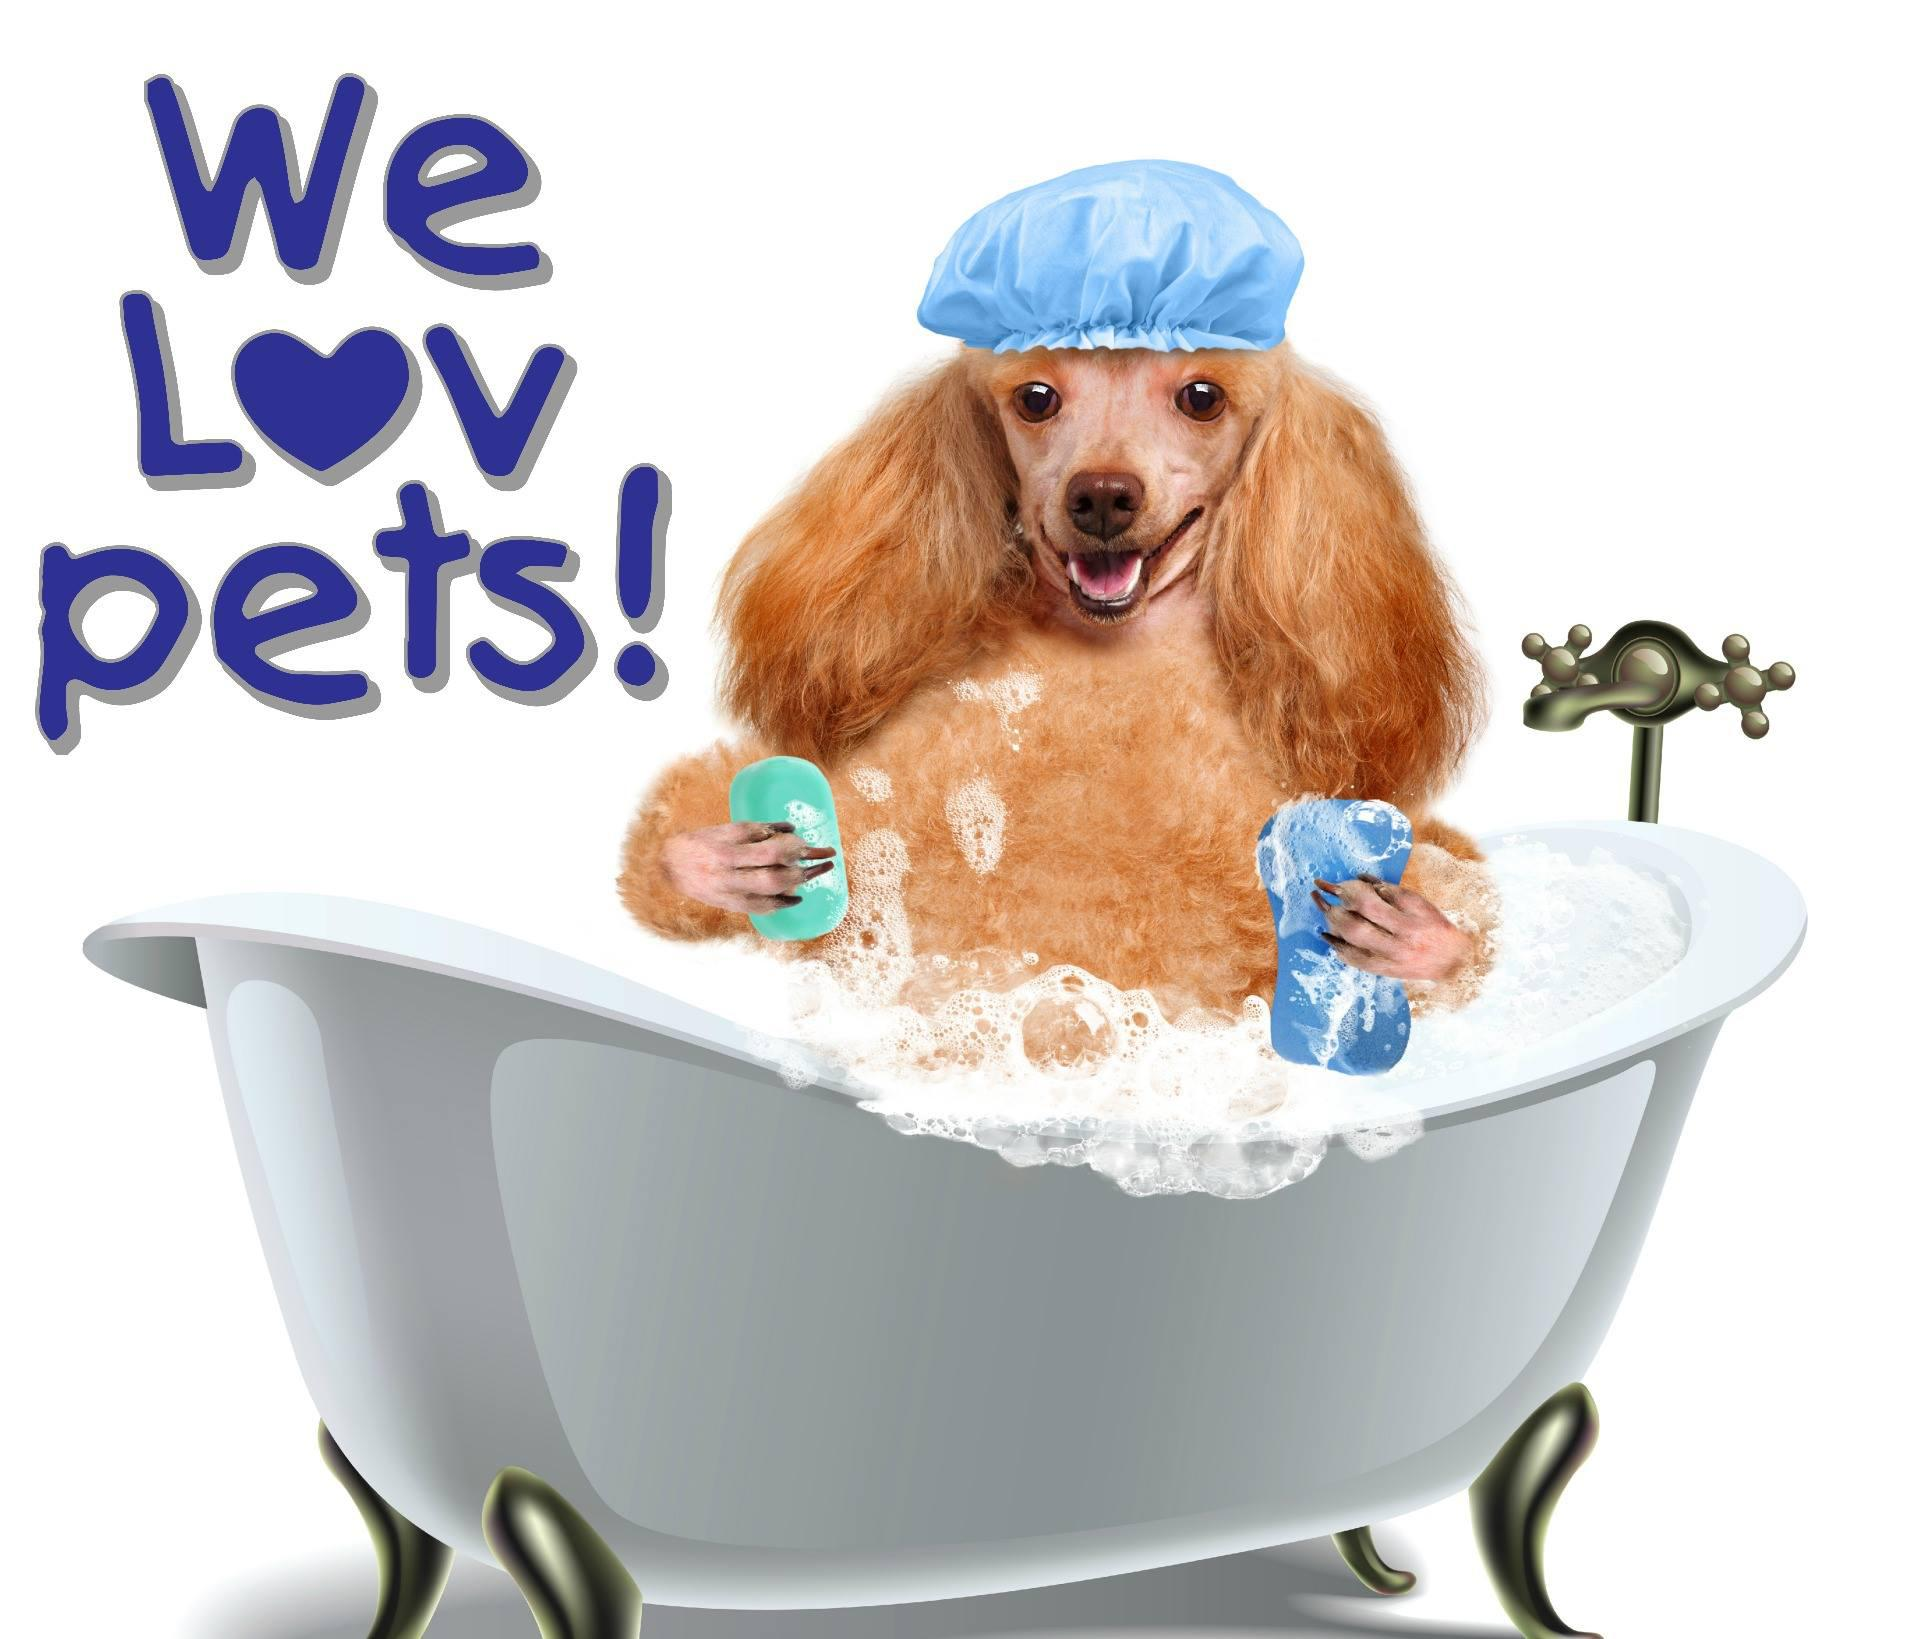 We Lov Pets